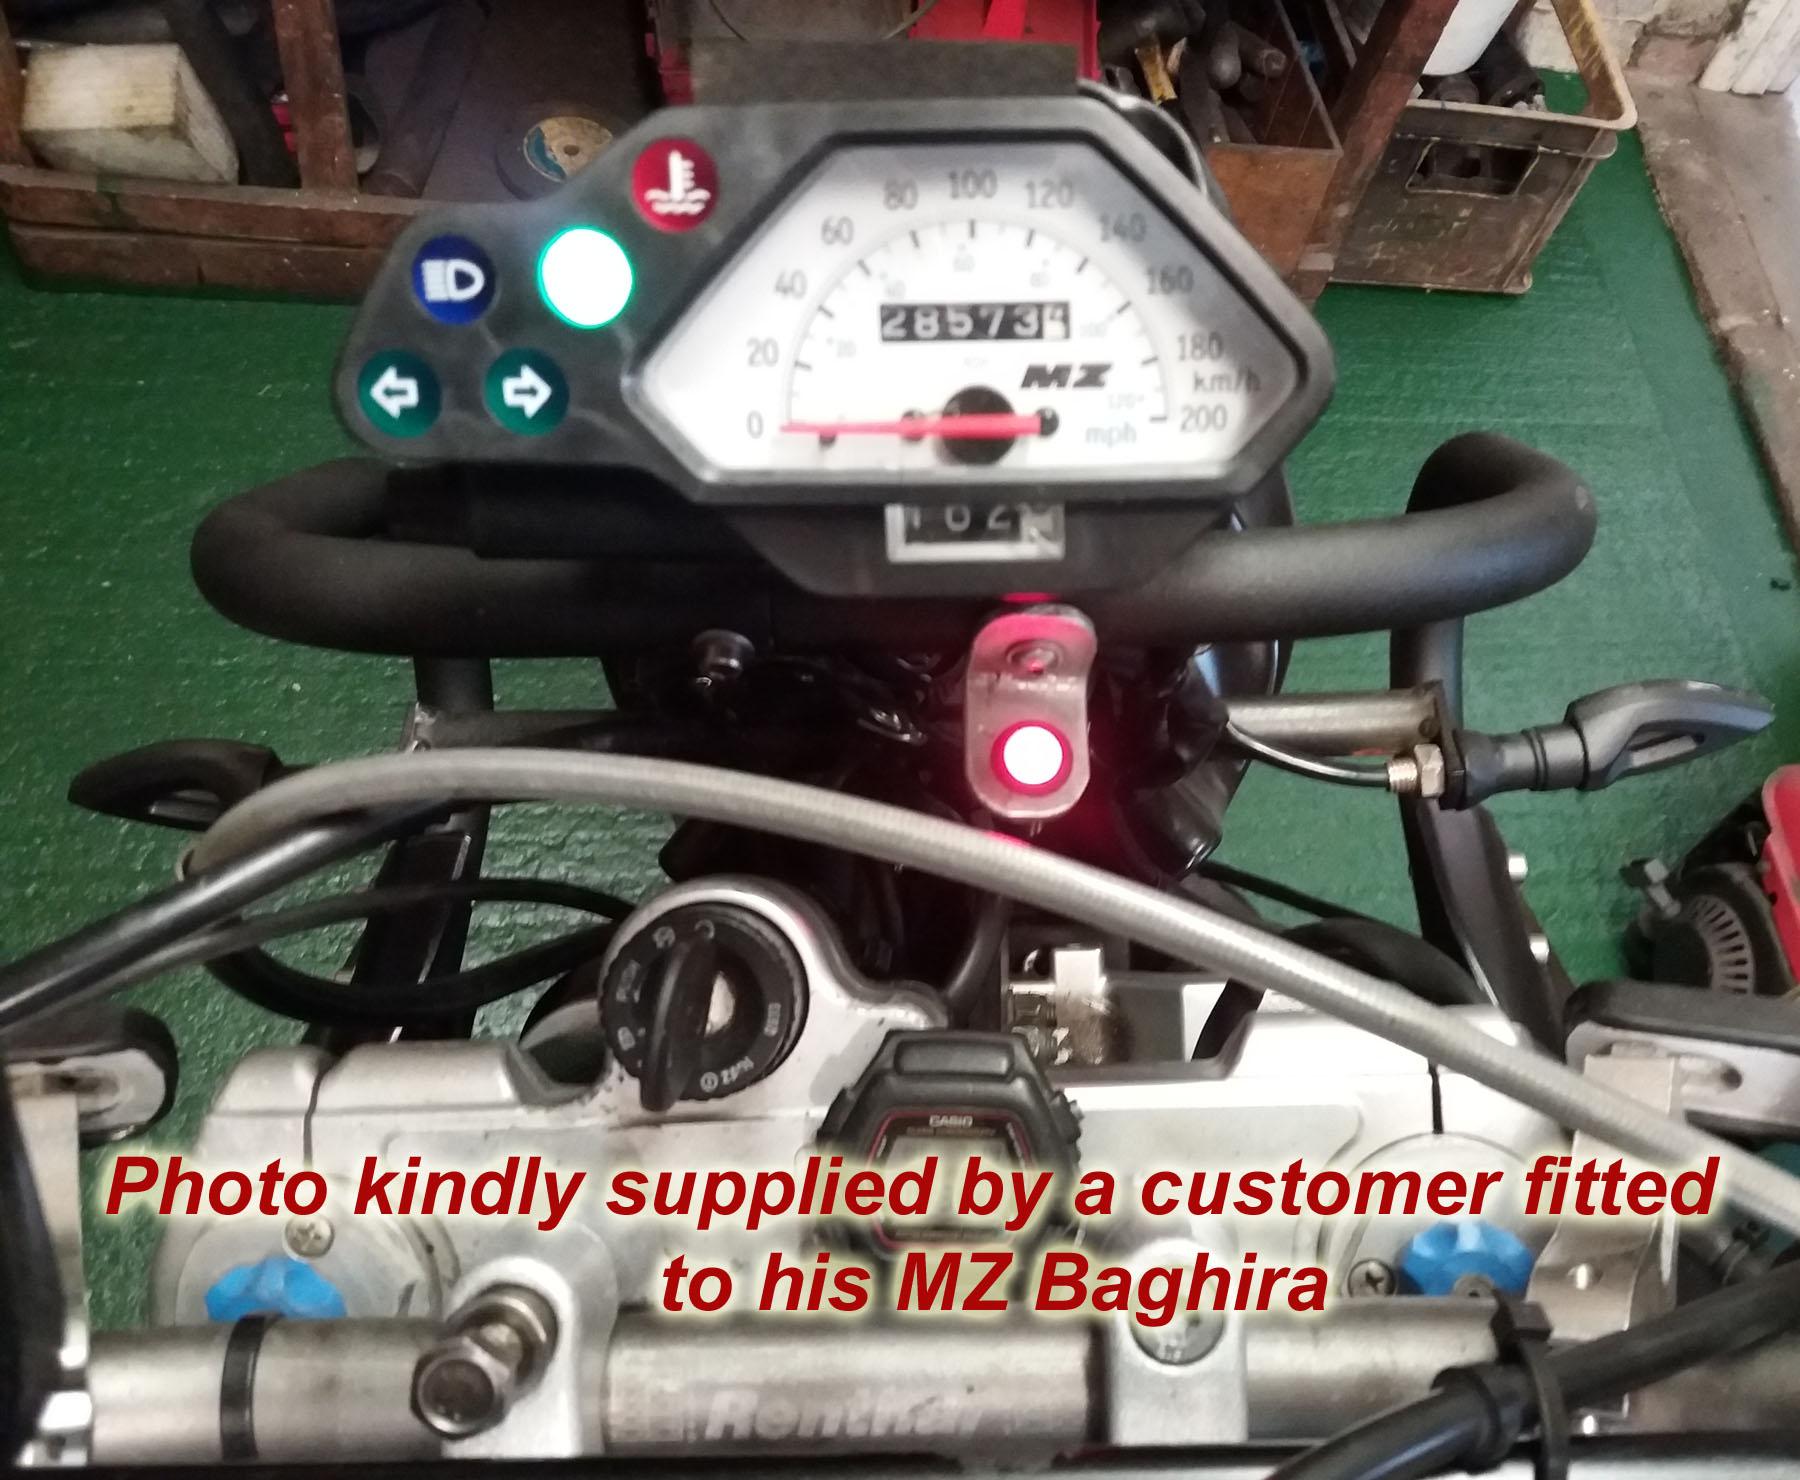 Icmcom Battery Alternator Ignition Warning Lights Charge Monitors 2wire Diagram Yamaha Mz Baghira Light